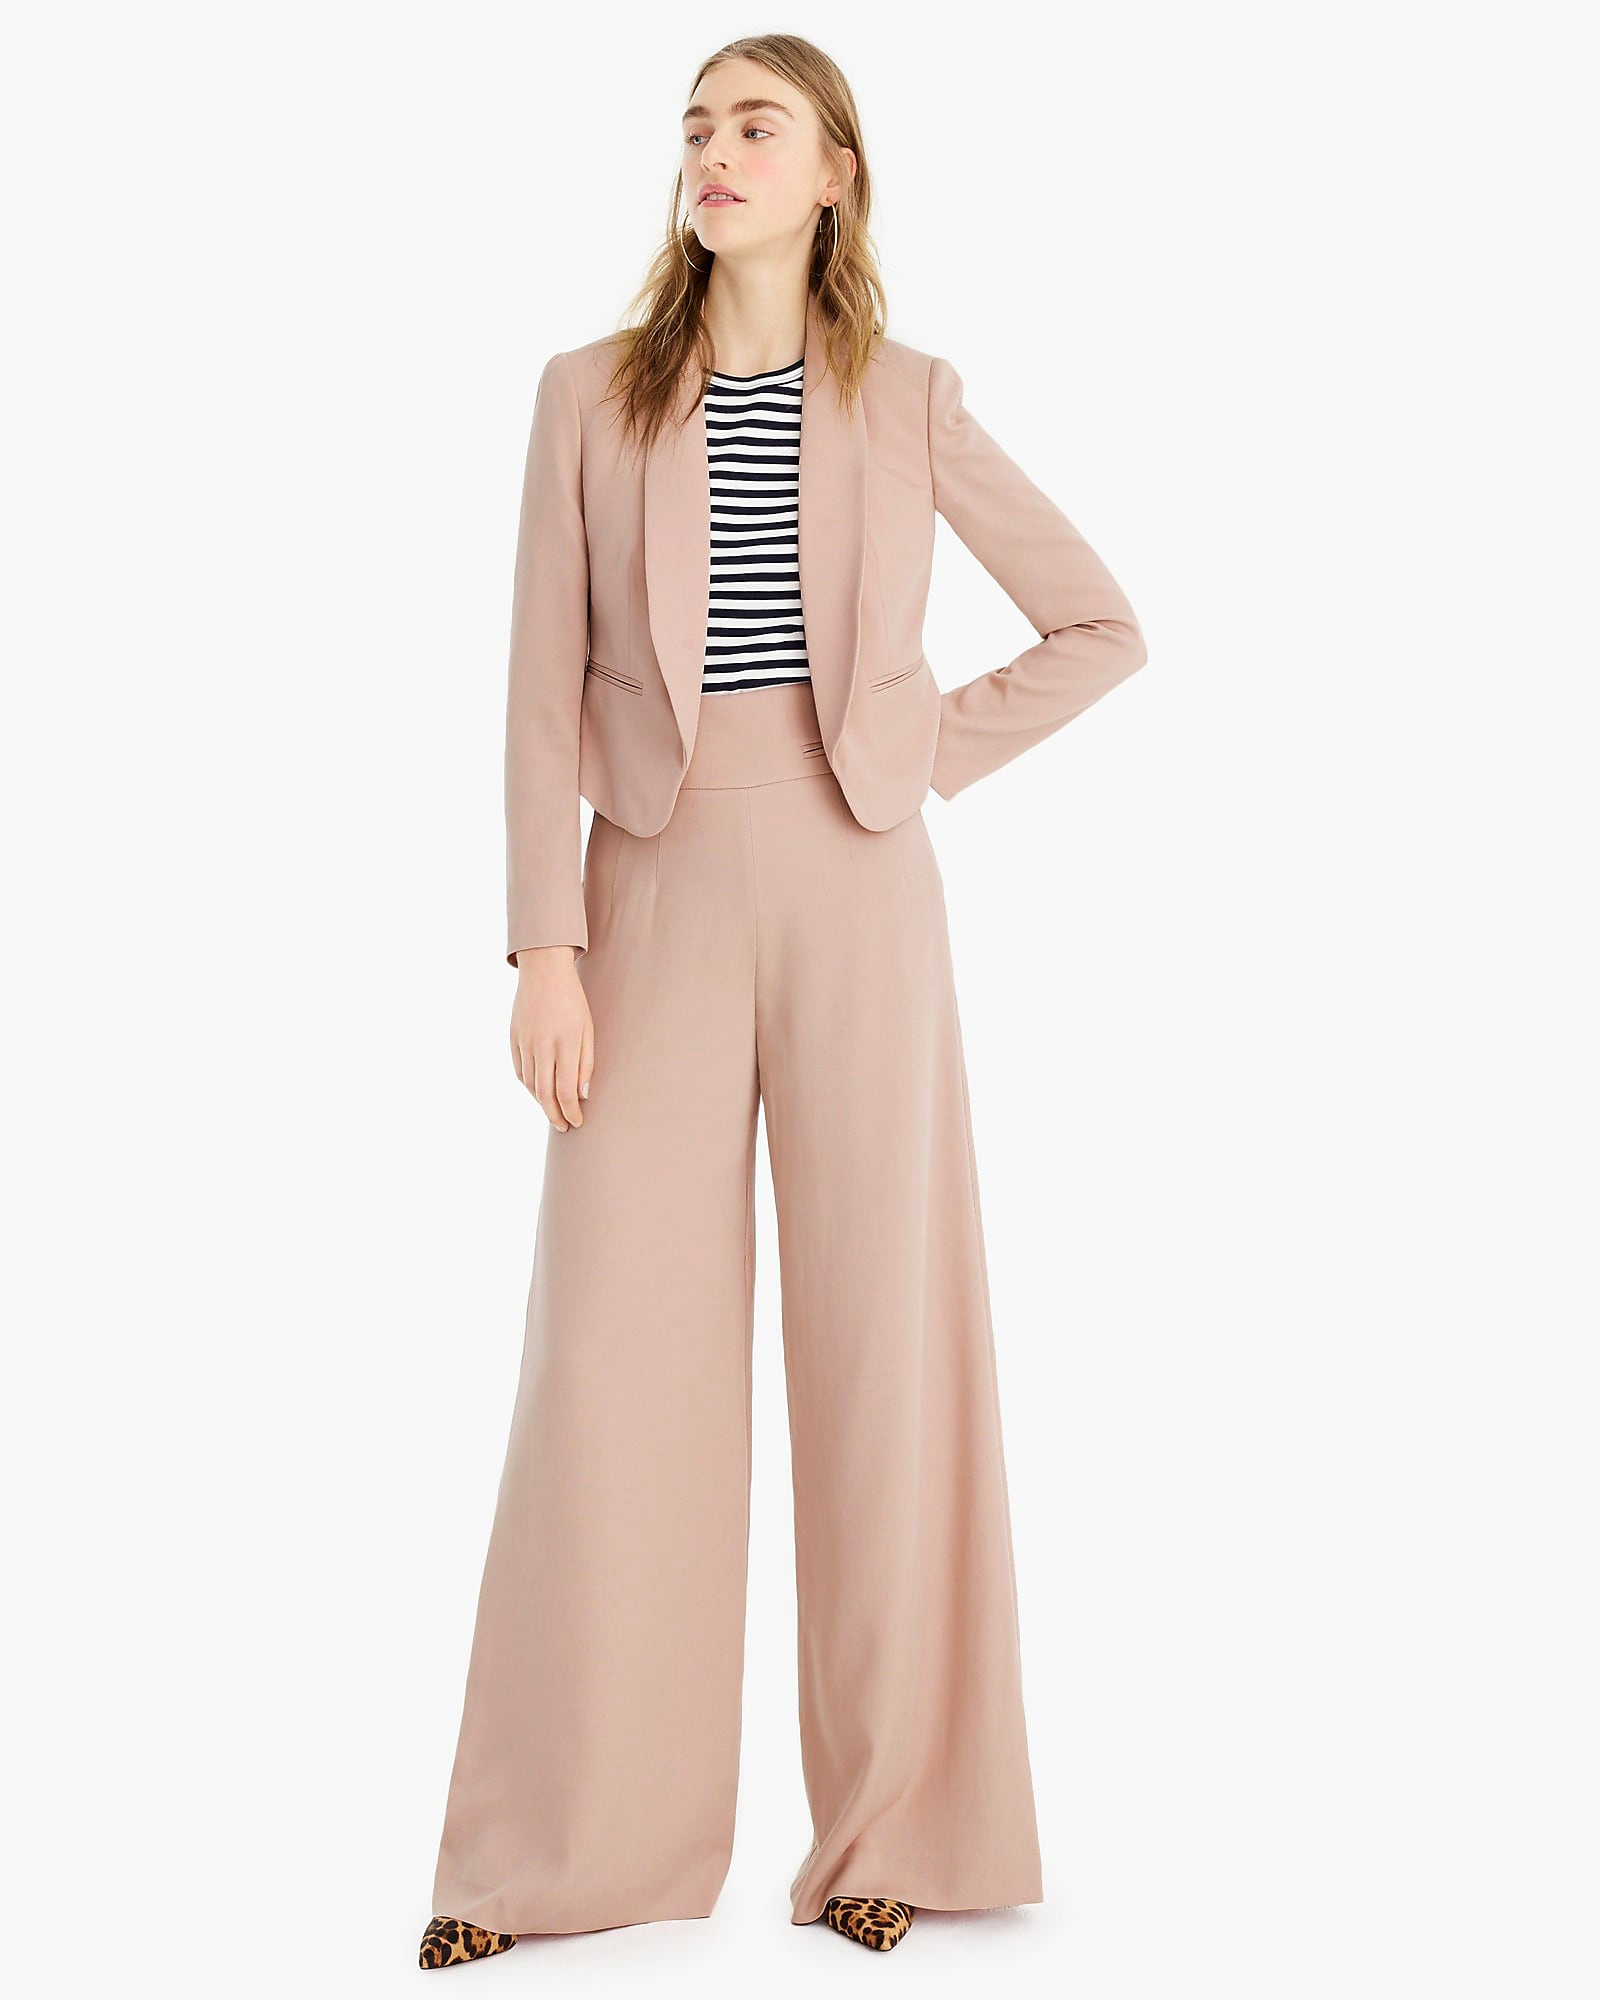 Shawl Collar Cropped Blazer Full-Length High-Rise Pants